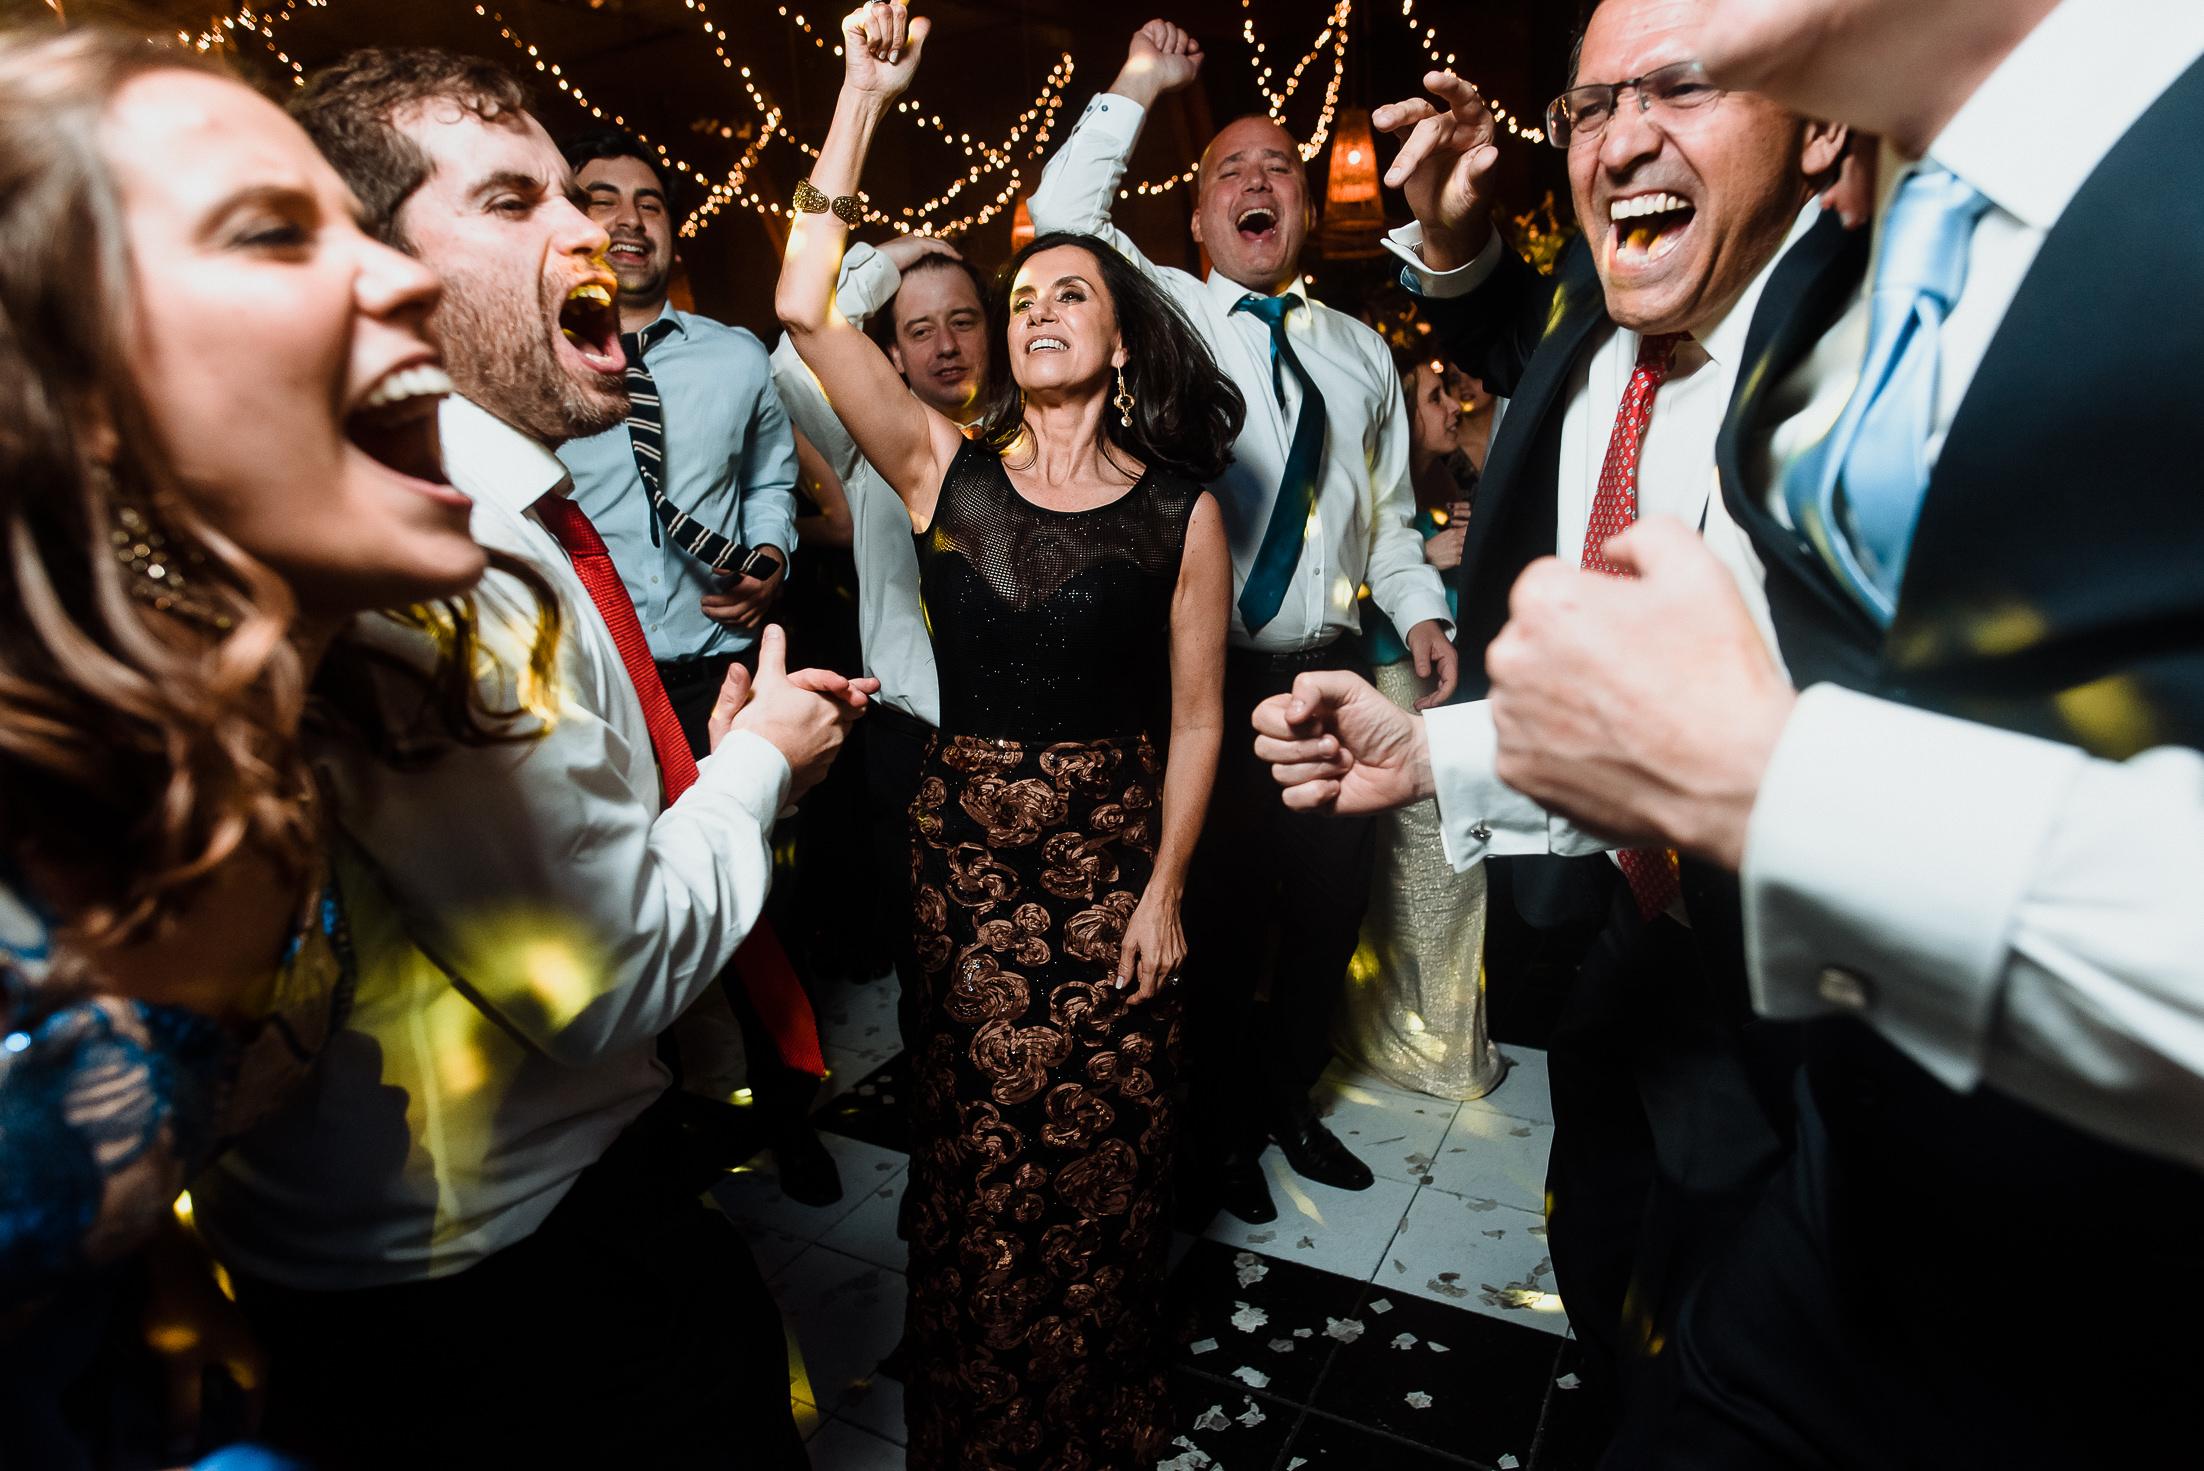 alto-san-francisco-centro-de-eventos-iglesia-ceremonia-religiosa-ignacia-tomas-deborah-dantzoff-fotografia-fotografo-matrimonios-chile